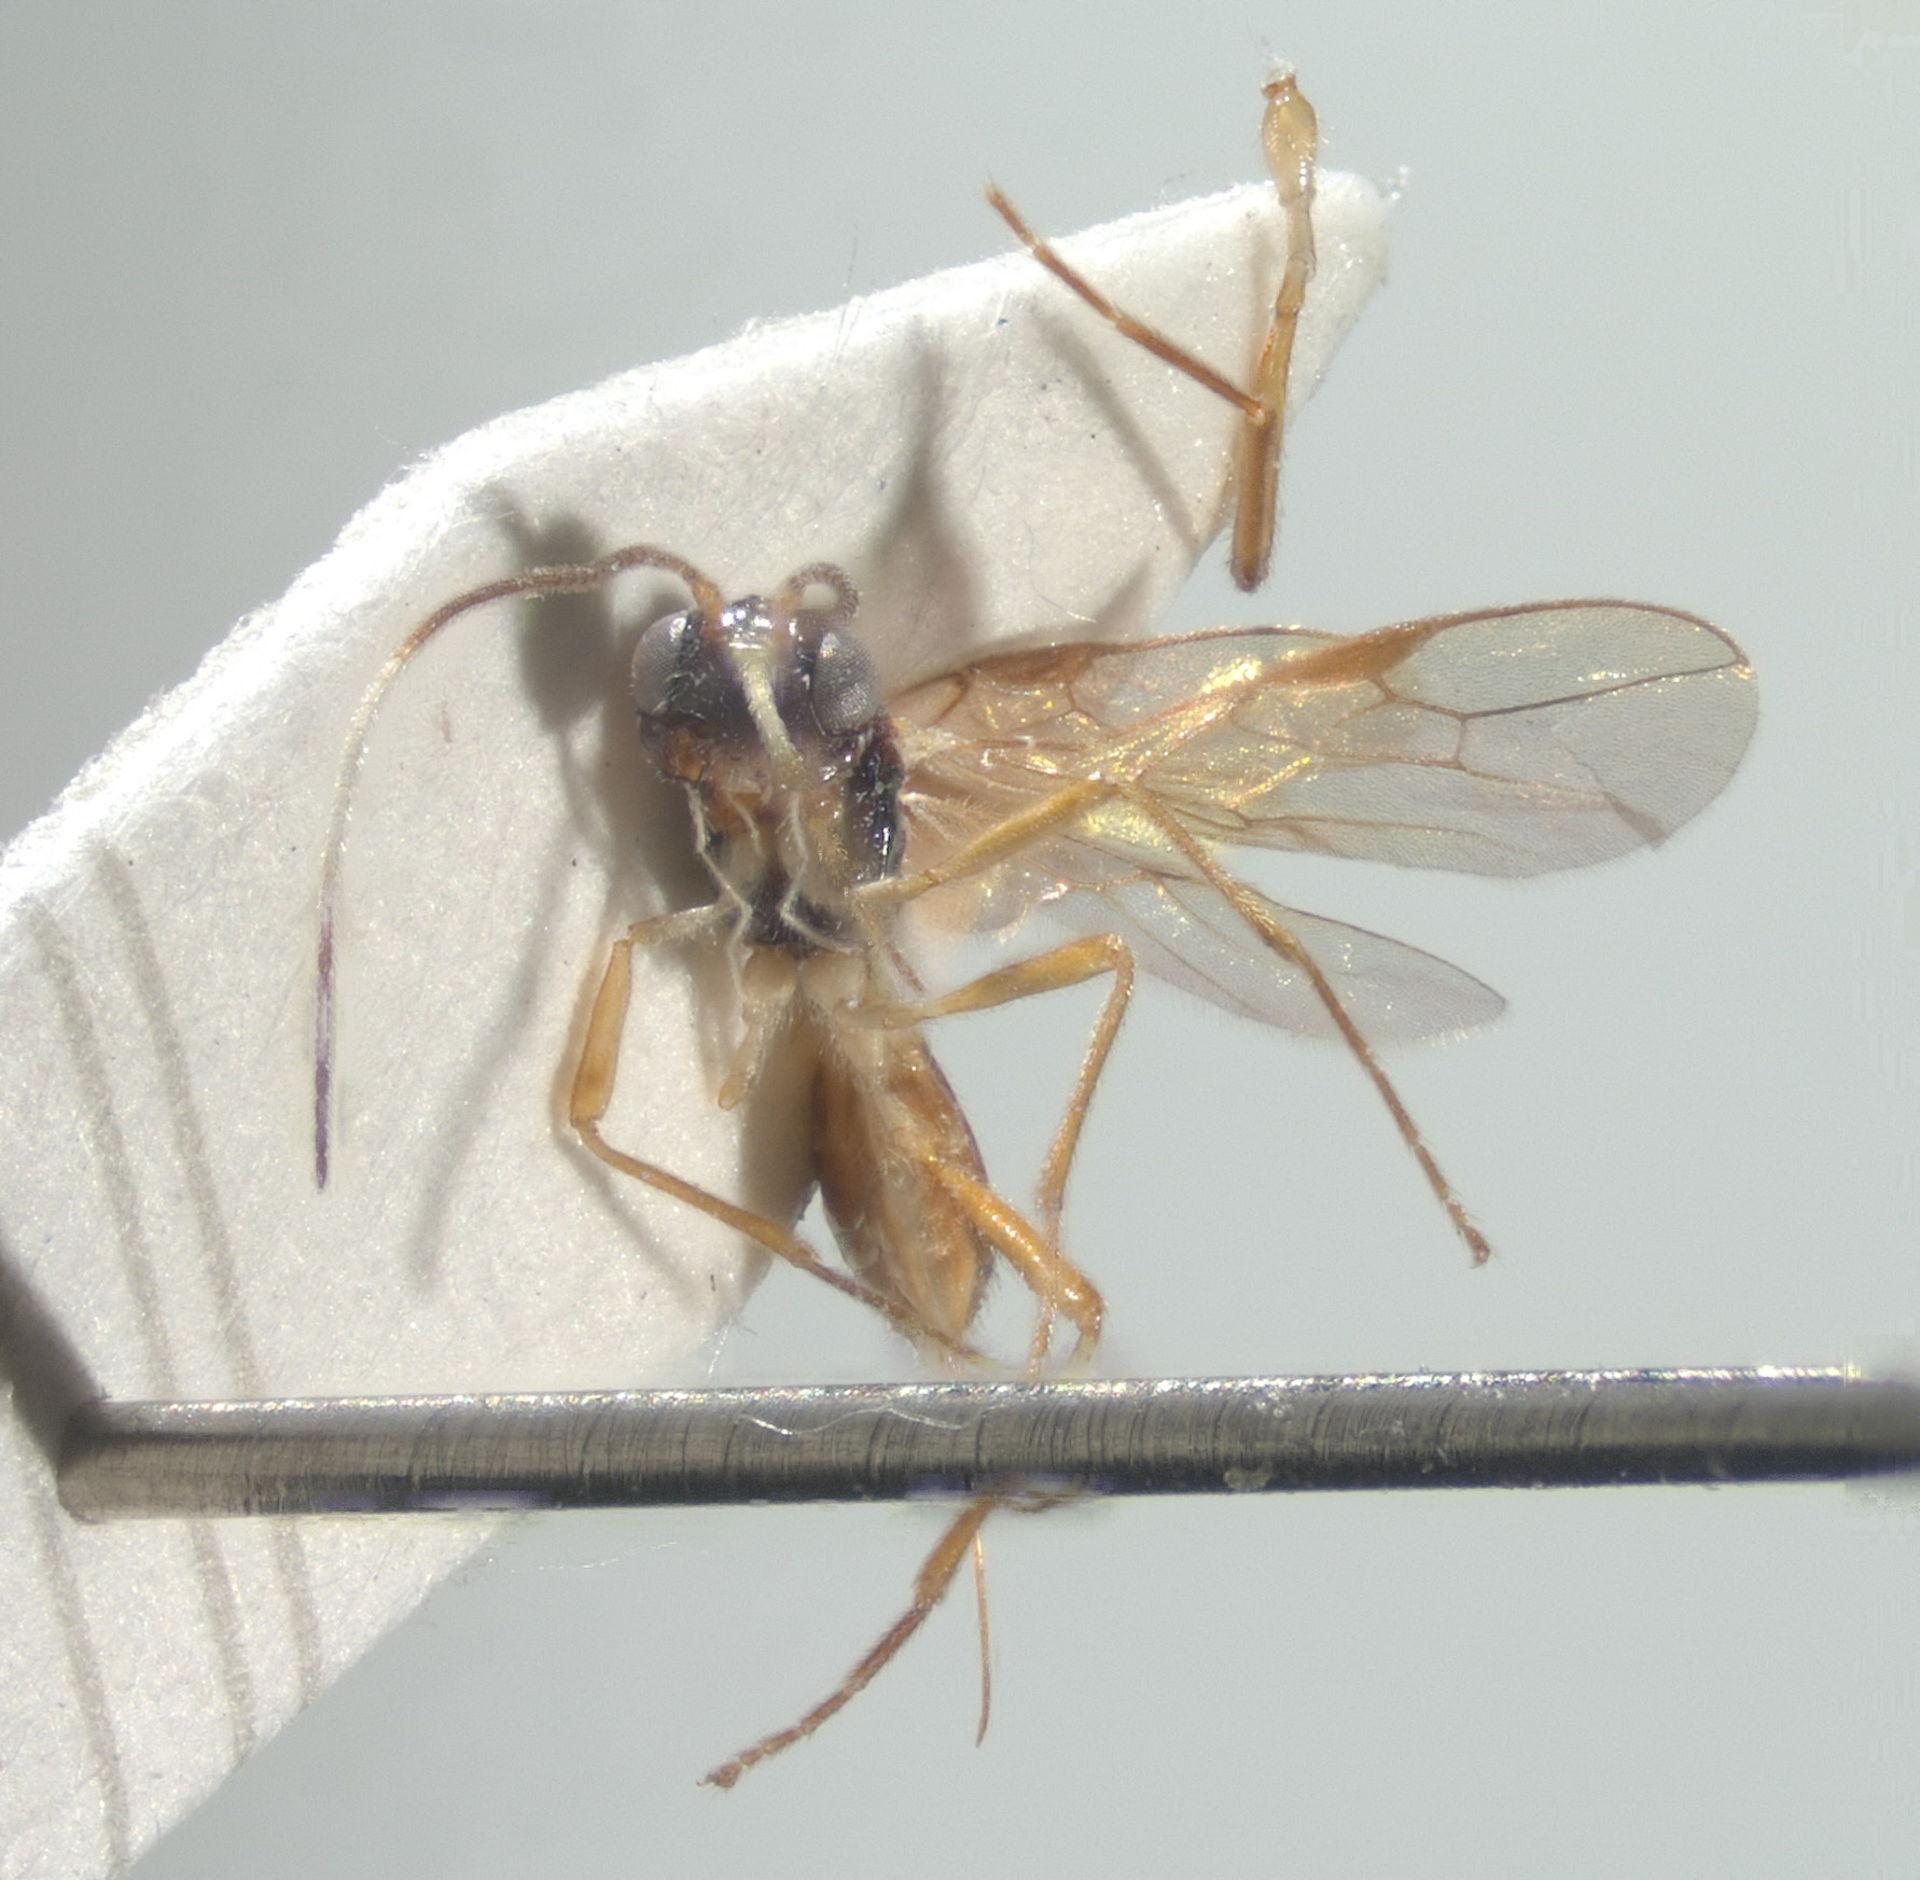 RMNH.INS.812721 | Orientiasta crenulata van Achterberg & Yaakop, 2012